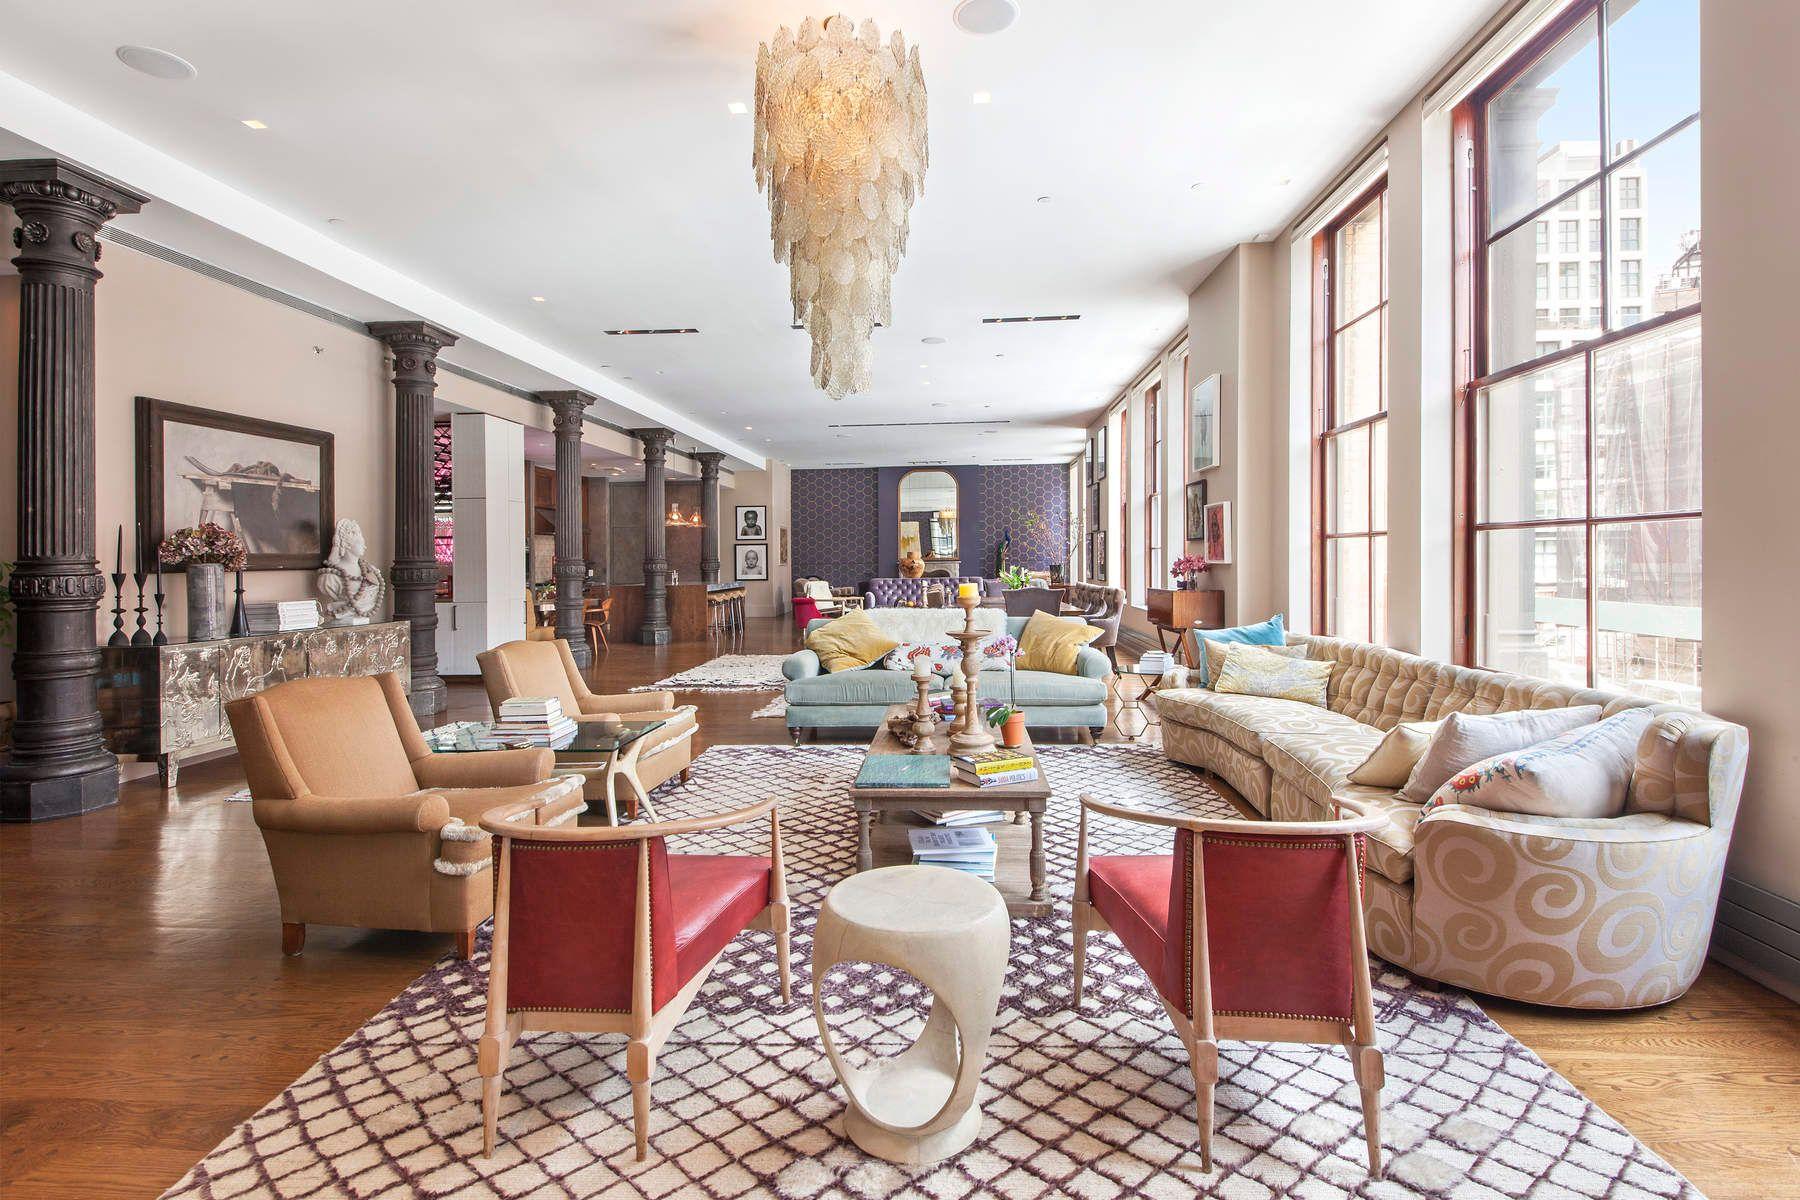 共管物業 為 出售 在 Brilliant Sunlight - Entertainers Dream! 140 Franklin Street, Tribeca, New York, 紐約州, 10013 美國